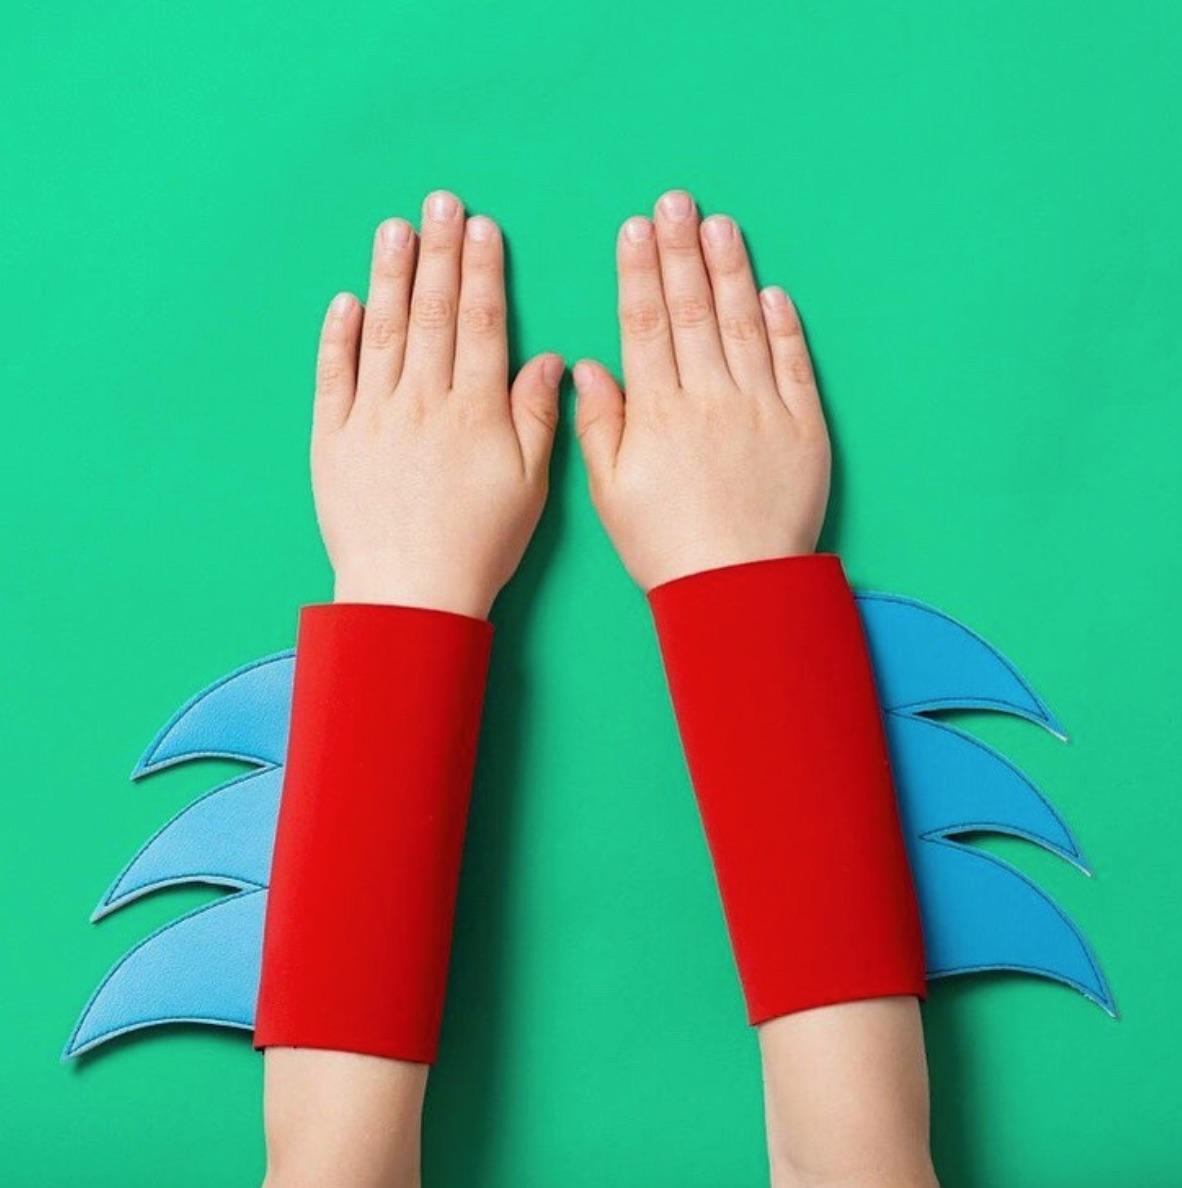 Superhero Cuffs : Iwishiwasa...